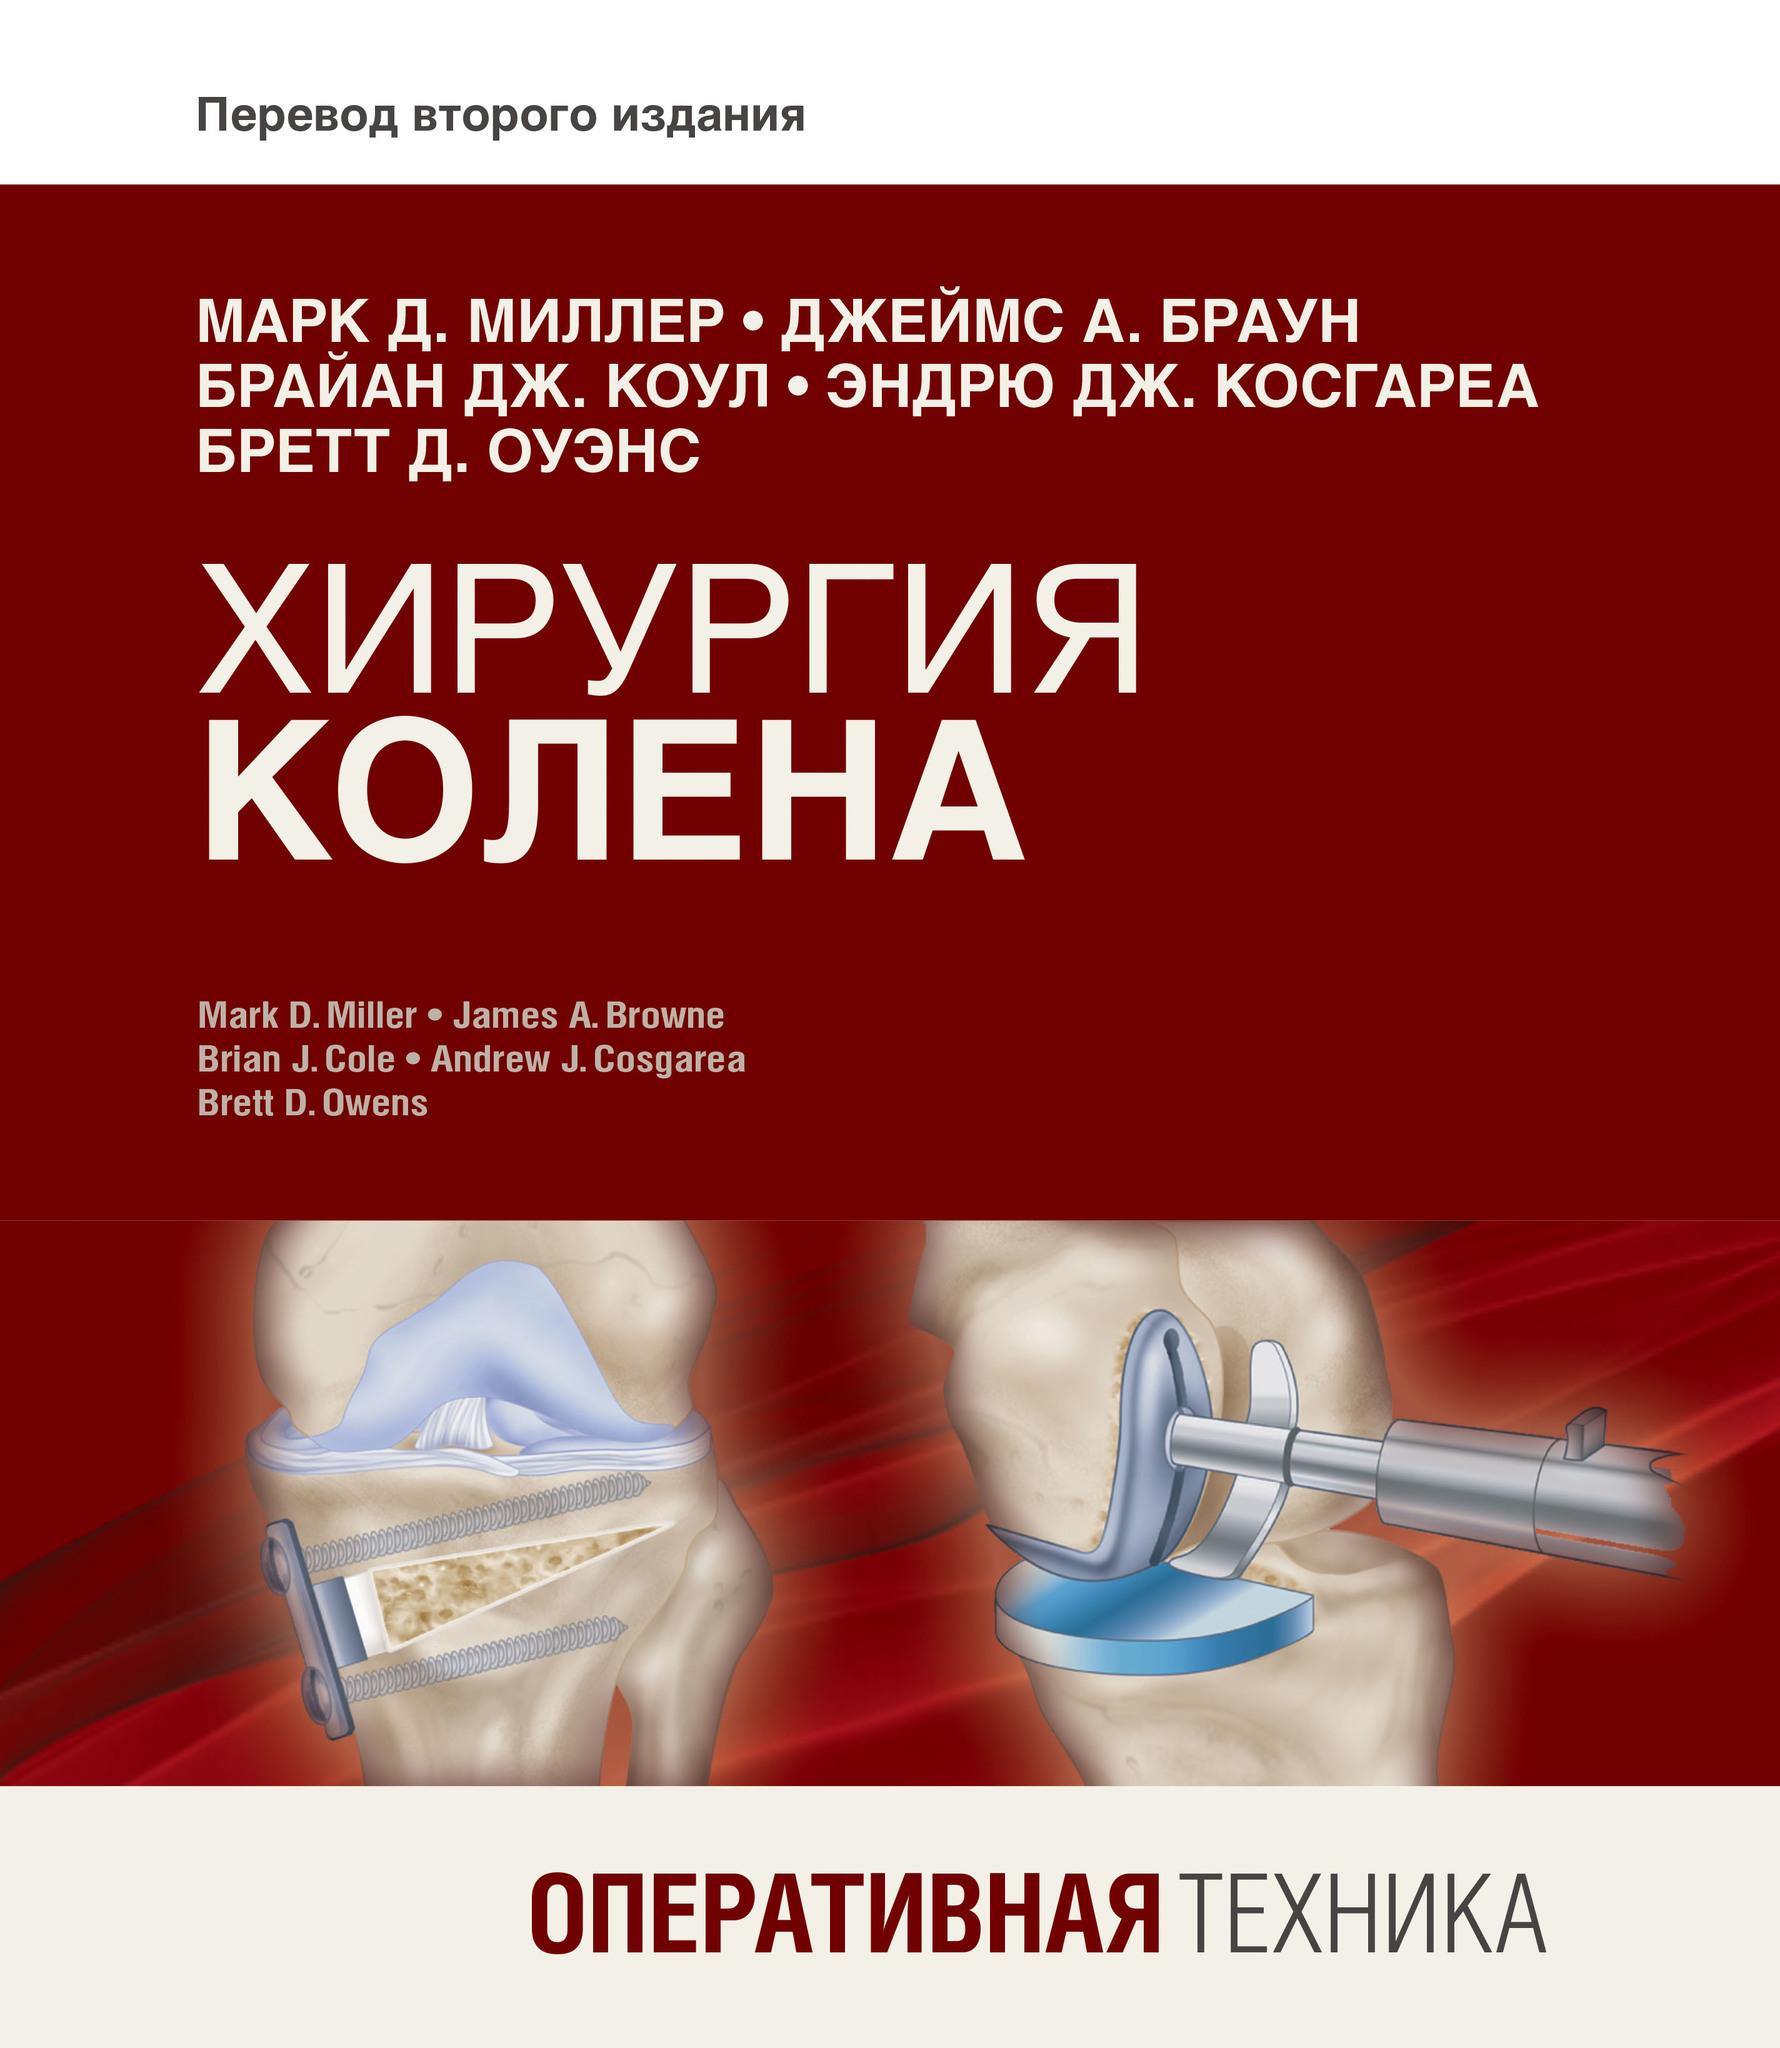 Каталог Хирургия колена. Оперативная техника (электронная книга) Knee_Surgery.jpg